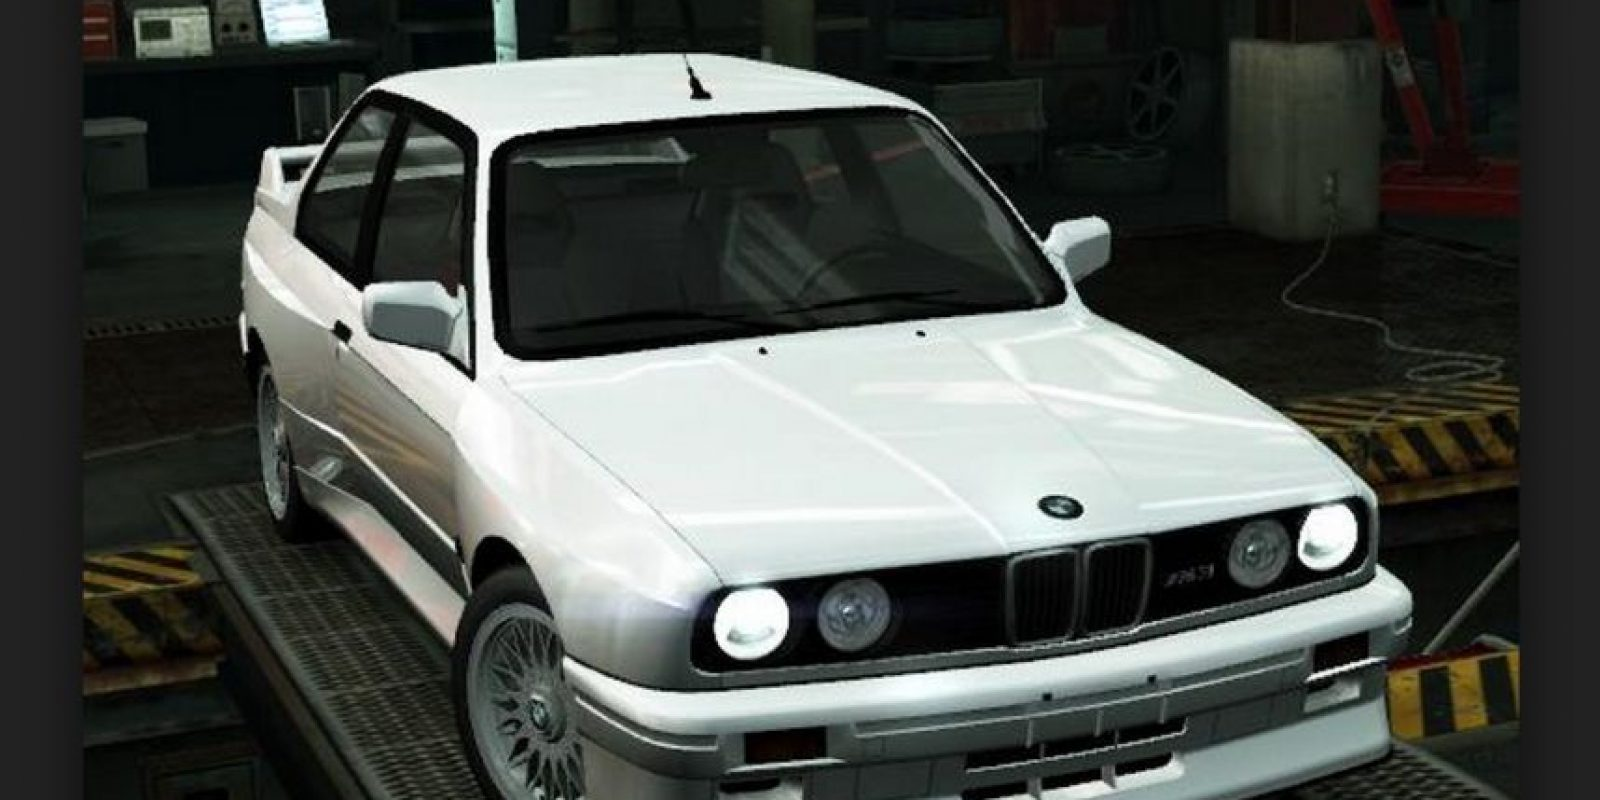 BMW M3 E30 Foto:Wikicommons